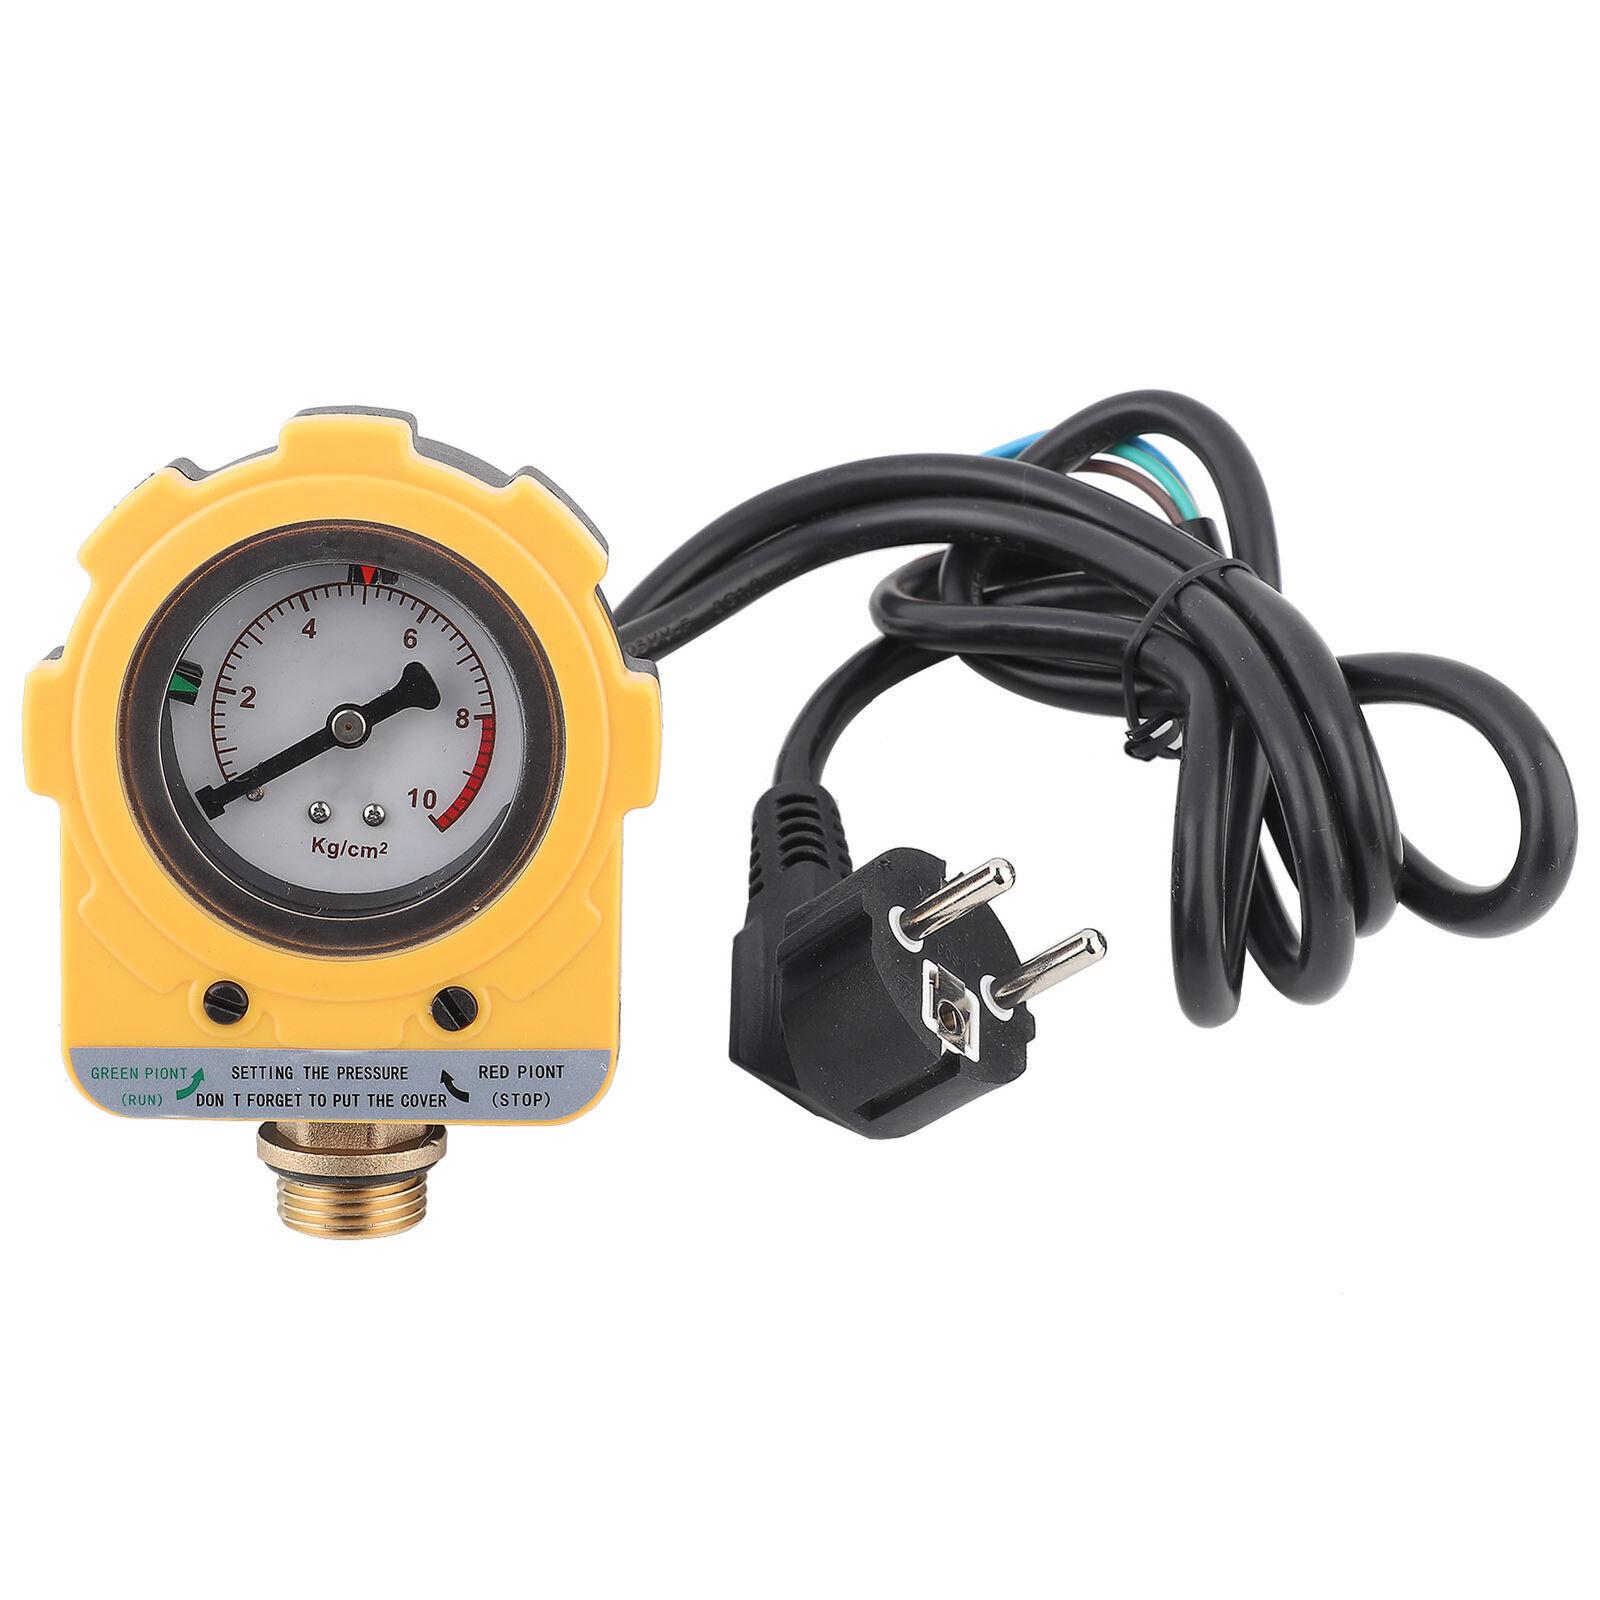 220V 10 Bar Pressure Controller Unit Electronic Switch for Water Pump (EU plug)